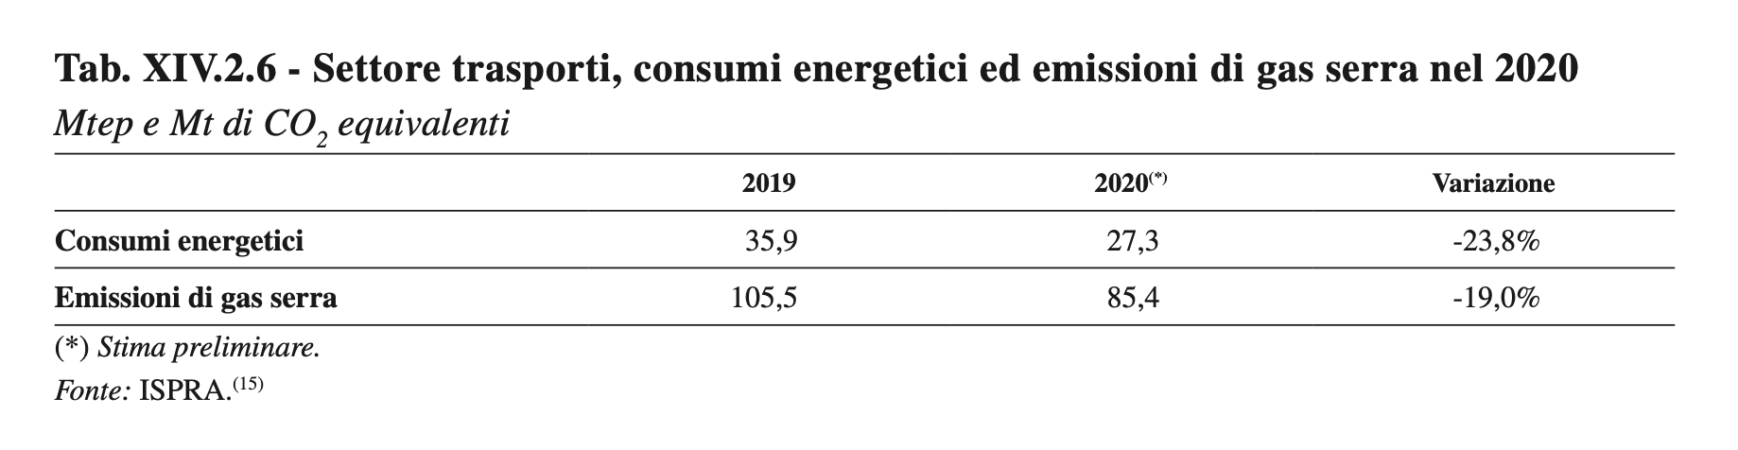 Trasporti 2020 consumi energetici e emissioni